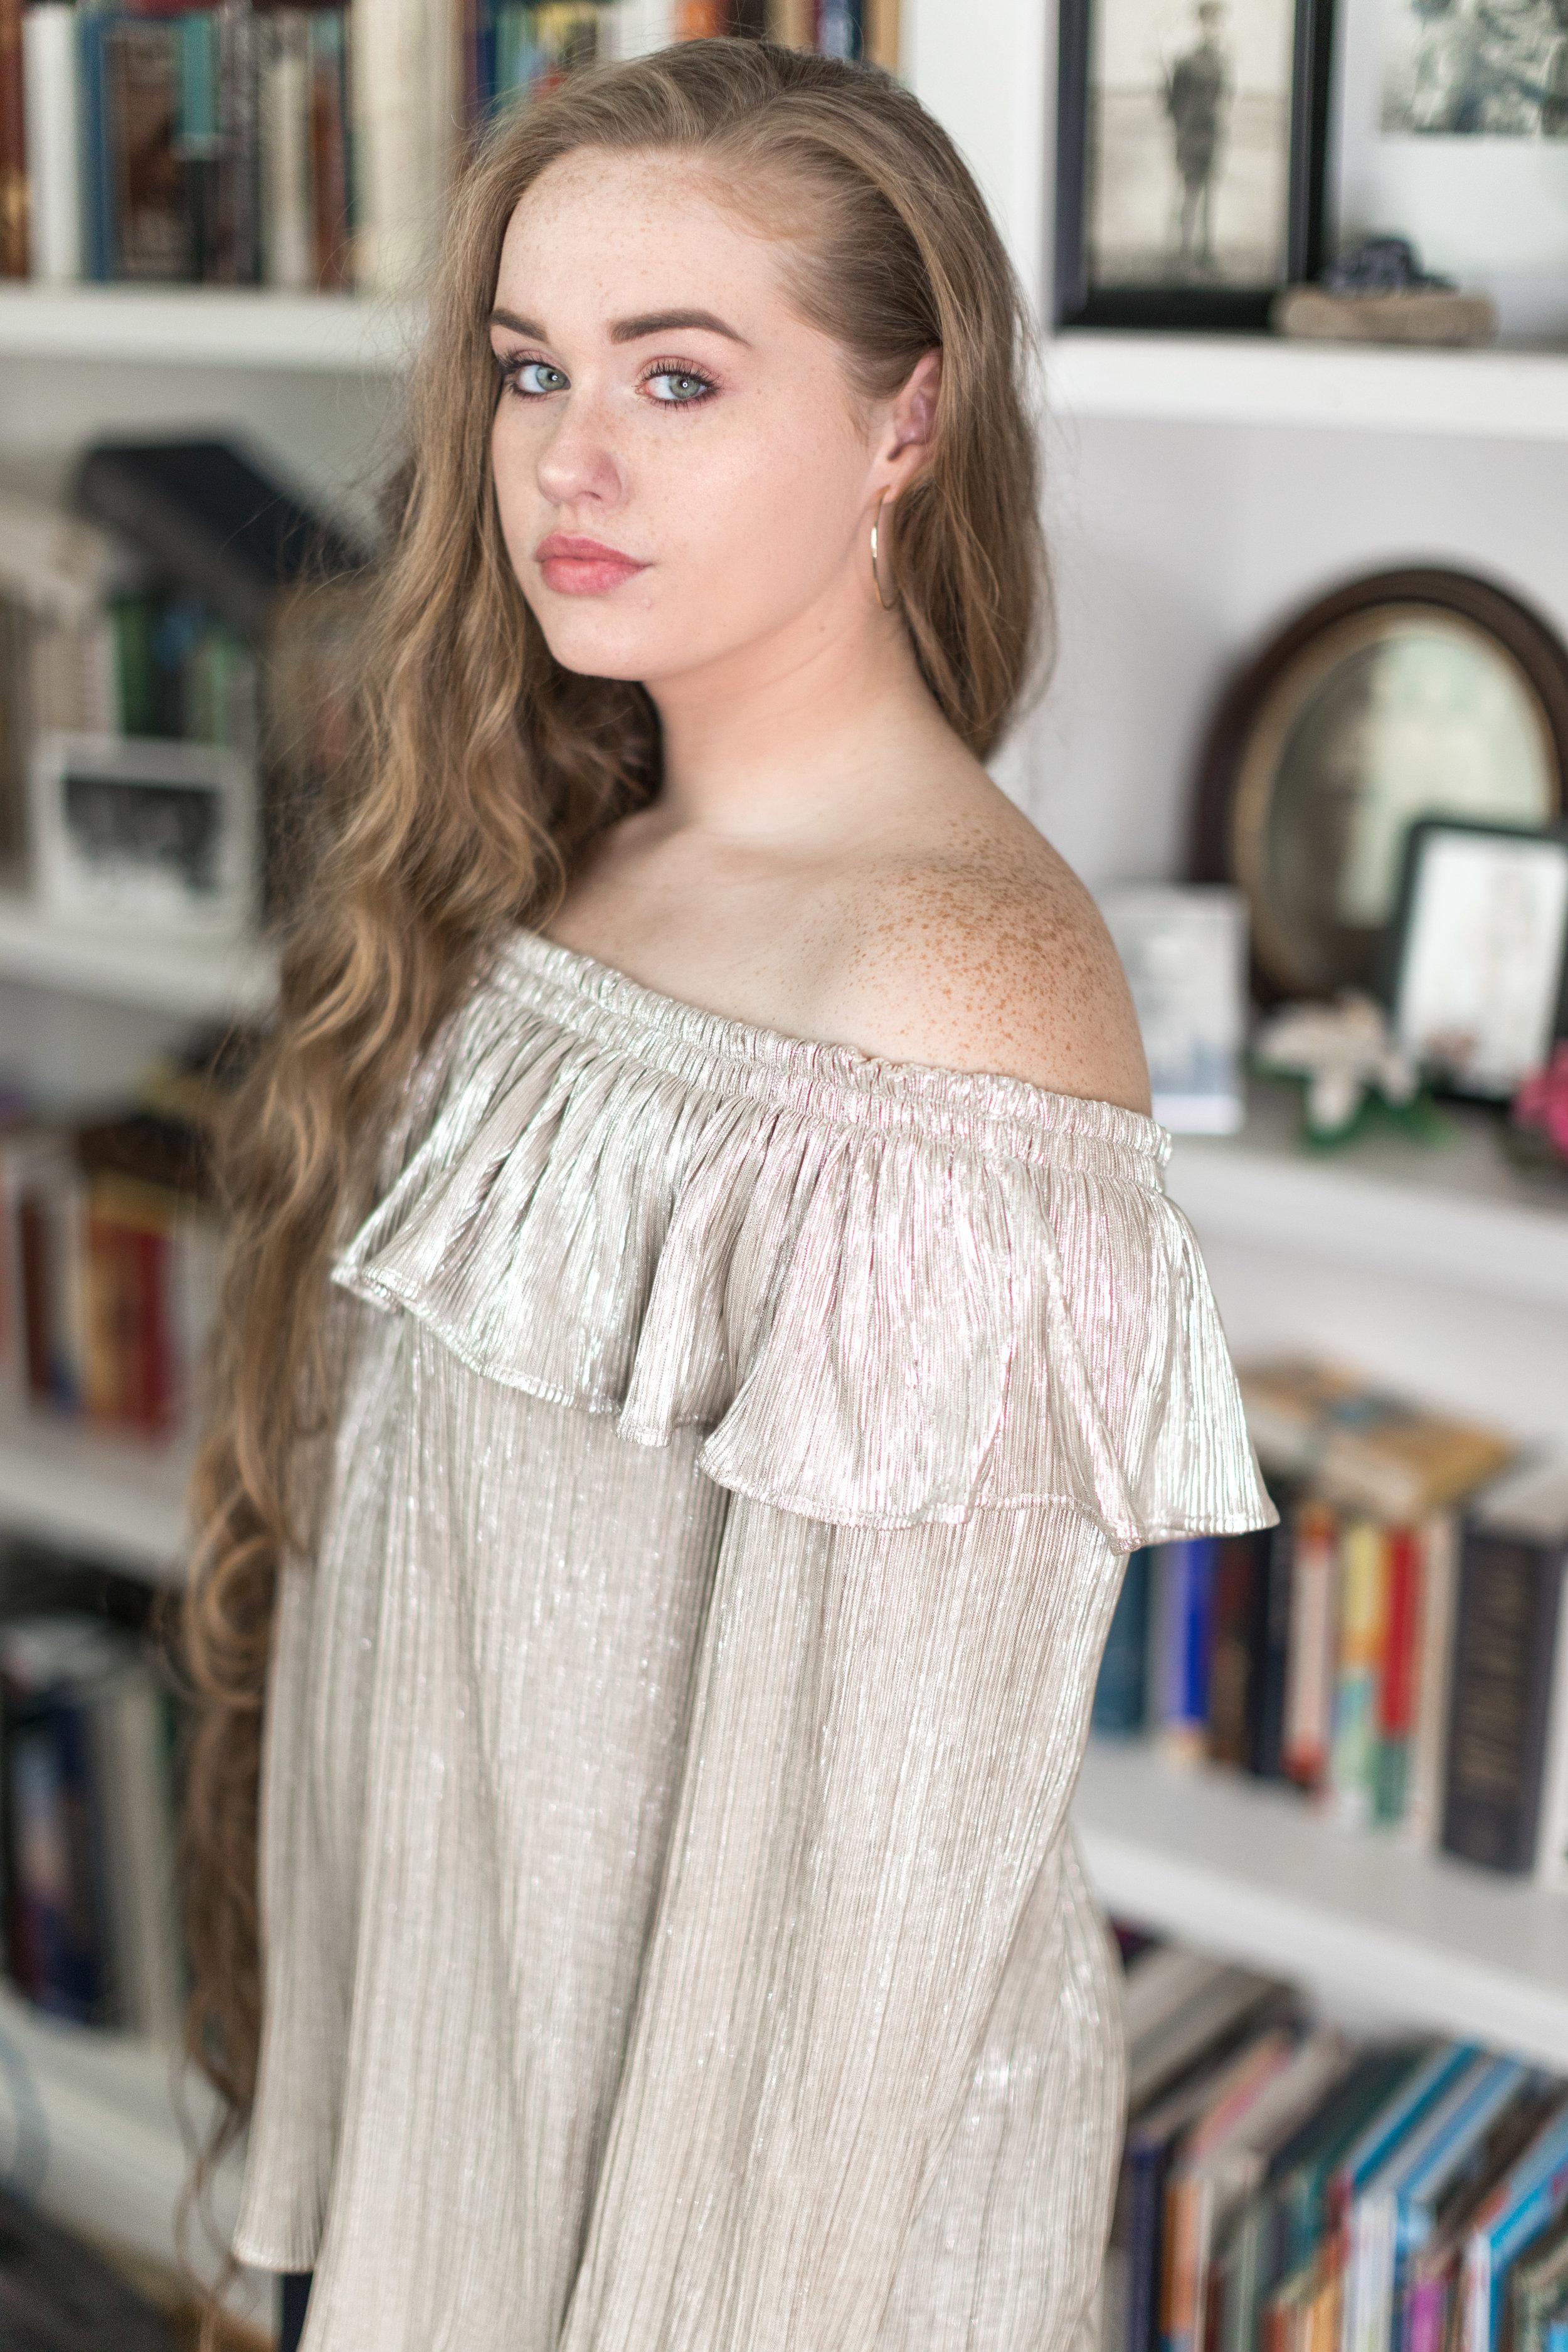 Aurora Top - Reviewed by Hannah C.